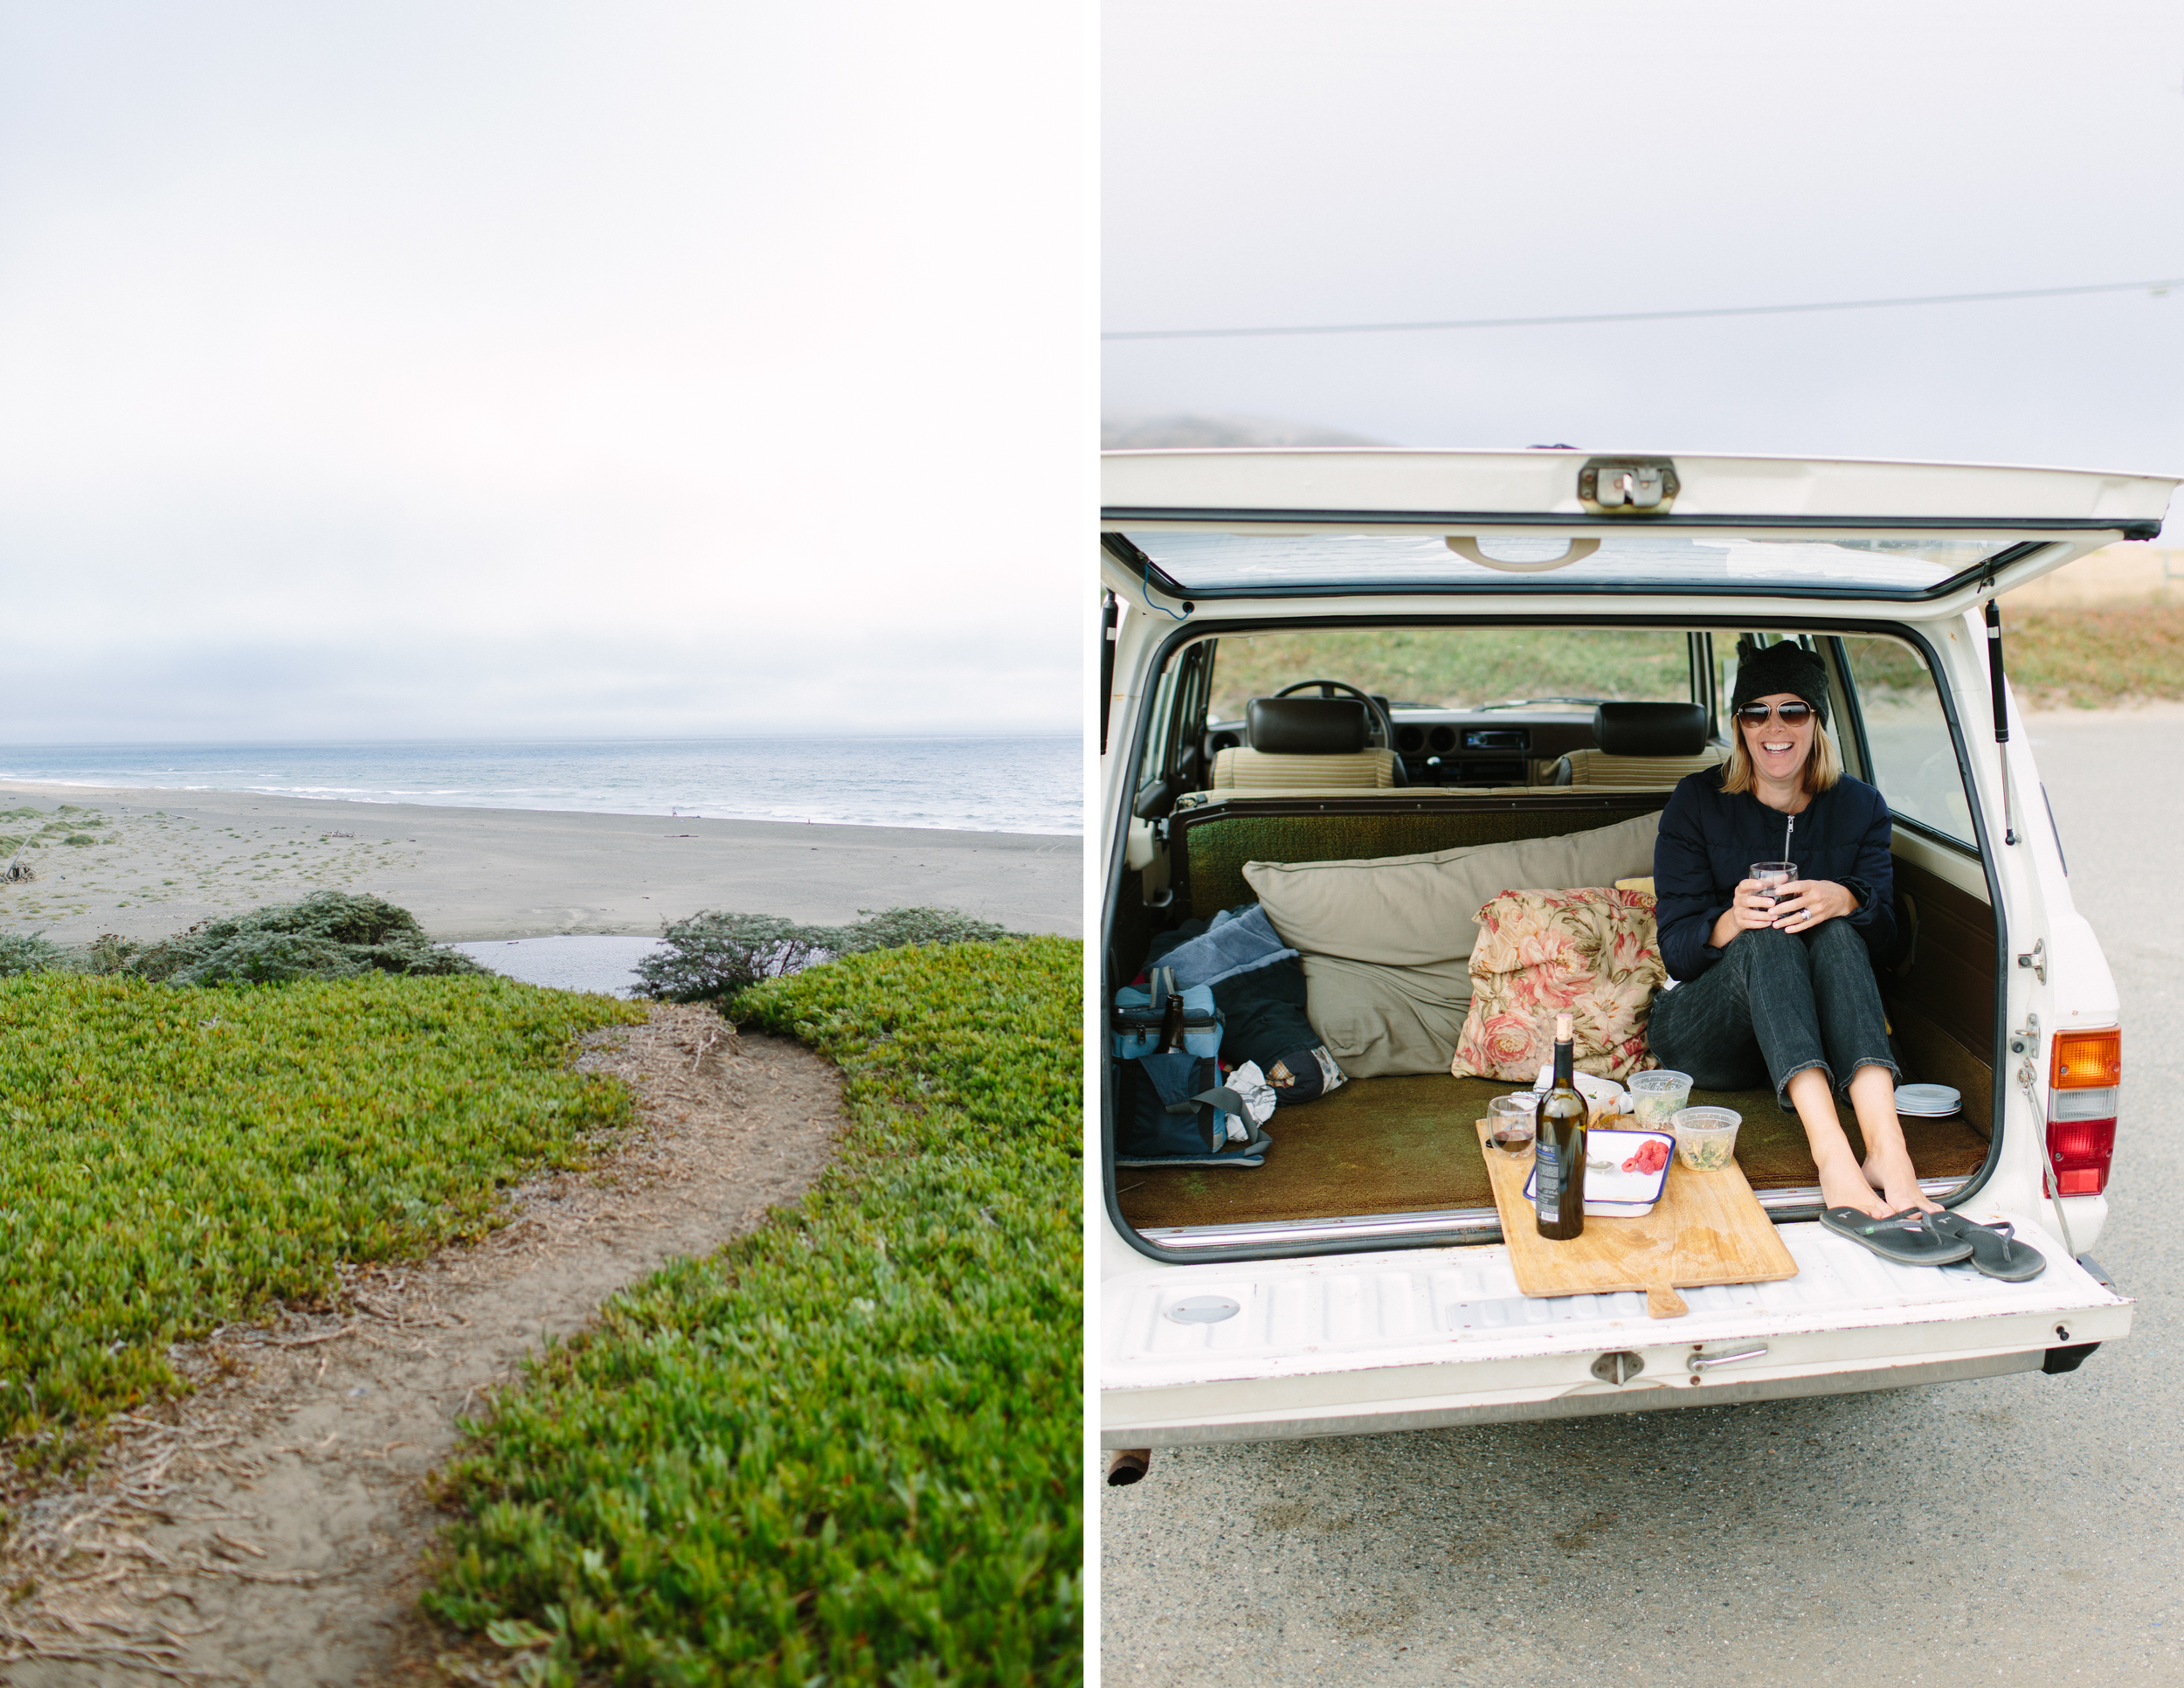 toyota landcruiser beach 3.jpg